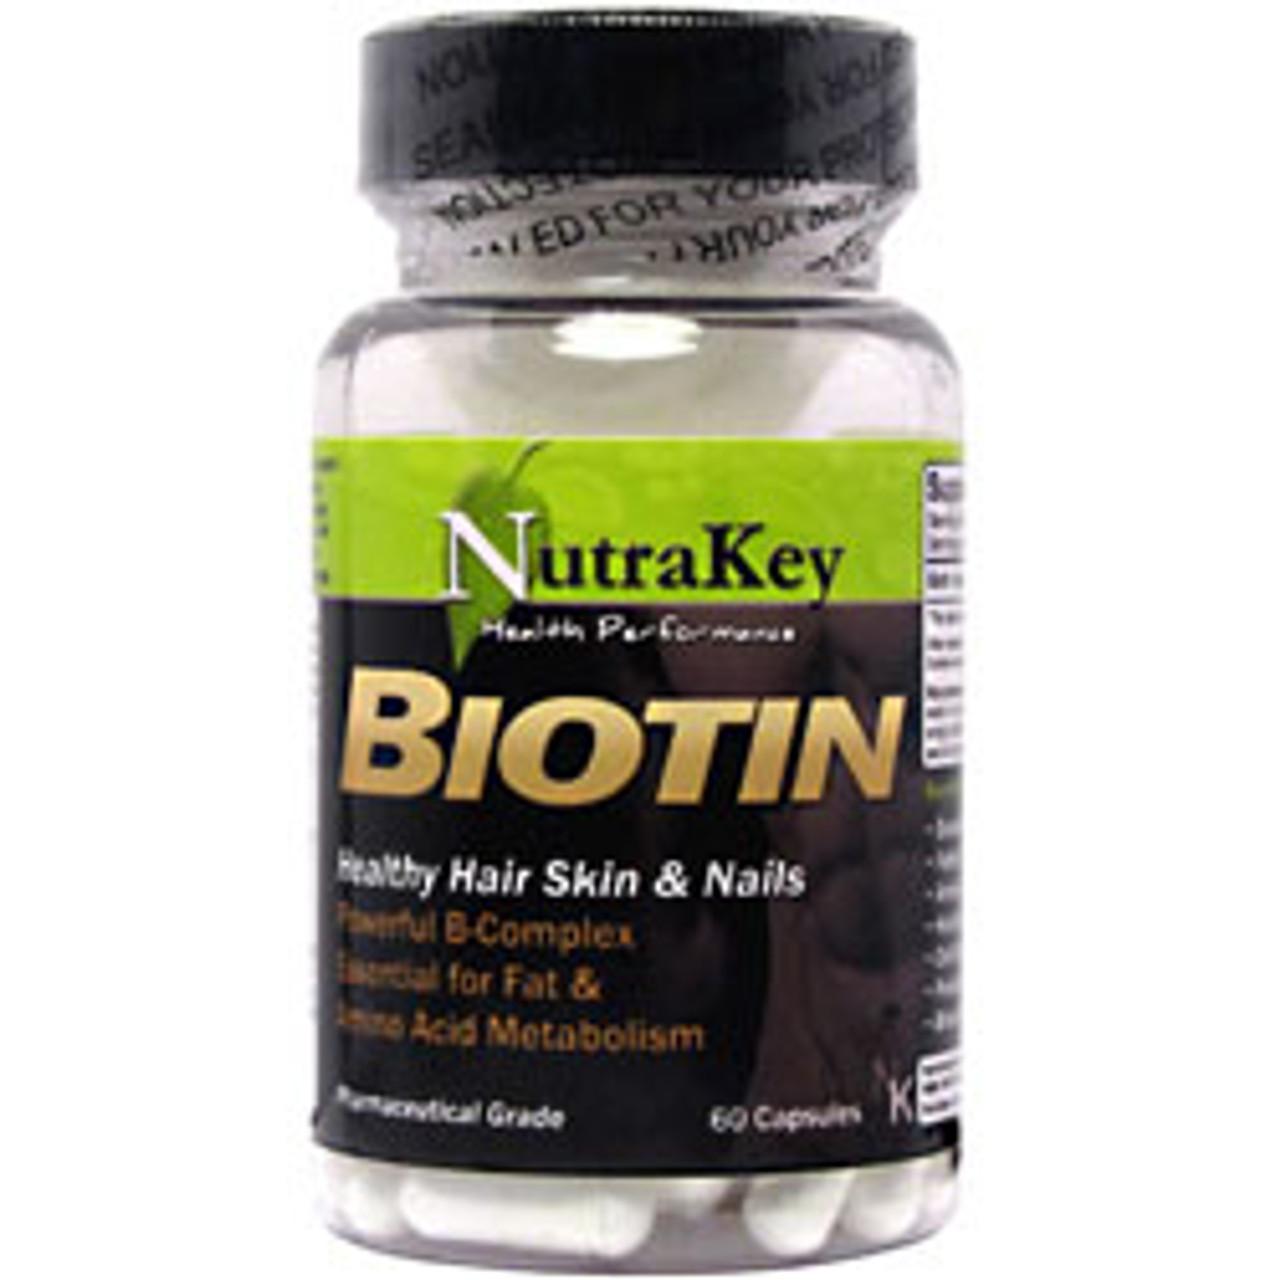 Biotin 60ct Nutrakey